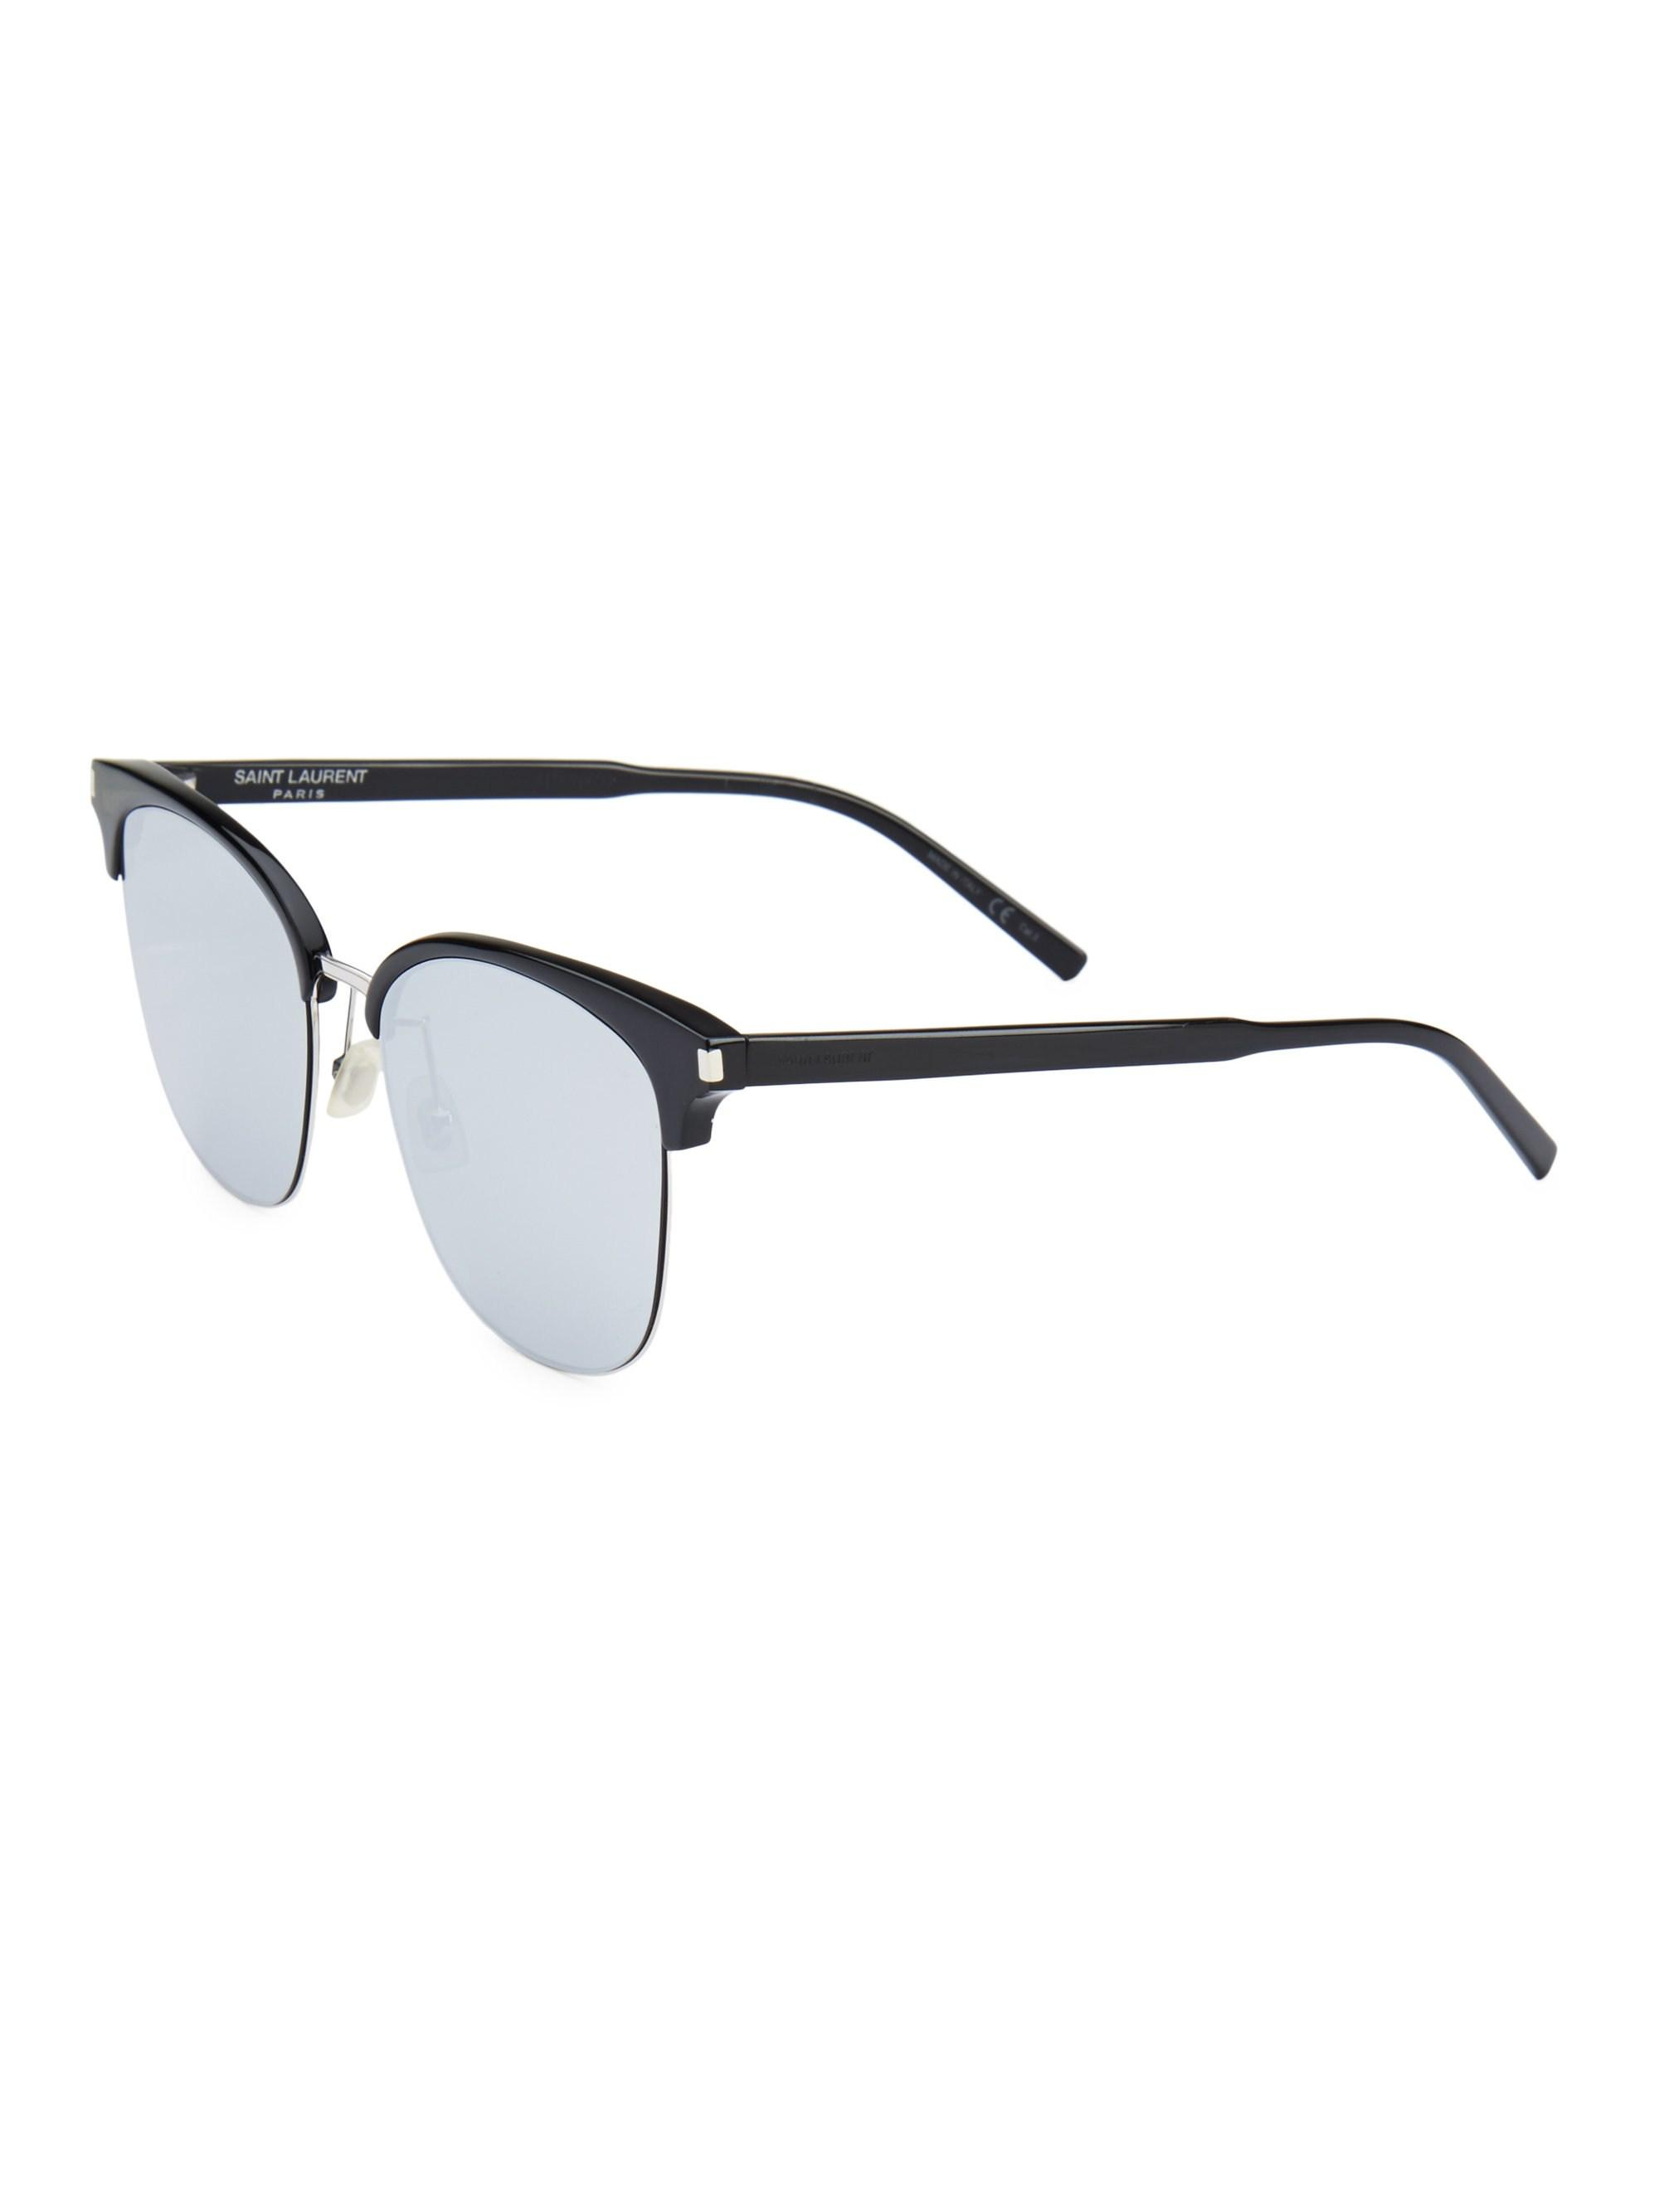 c6ddd4bd87 Saint Laurent - Metallic Men s 57mm Clubmaster Sunglasses - Black Silver  for Men - Lyst. View fullscreen